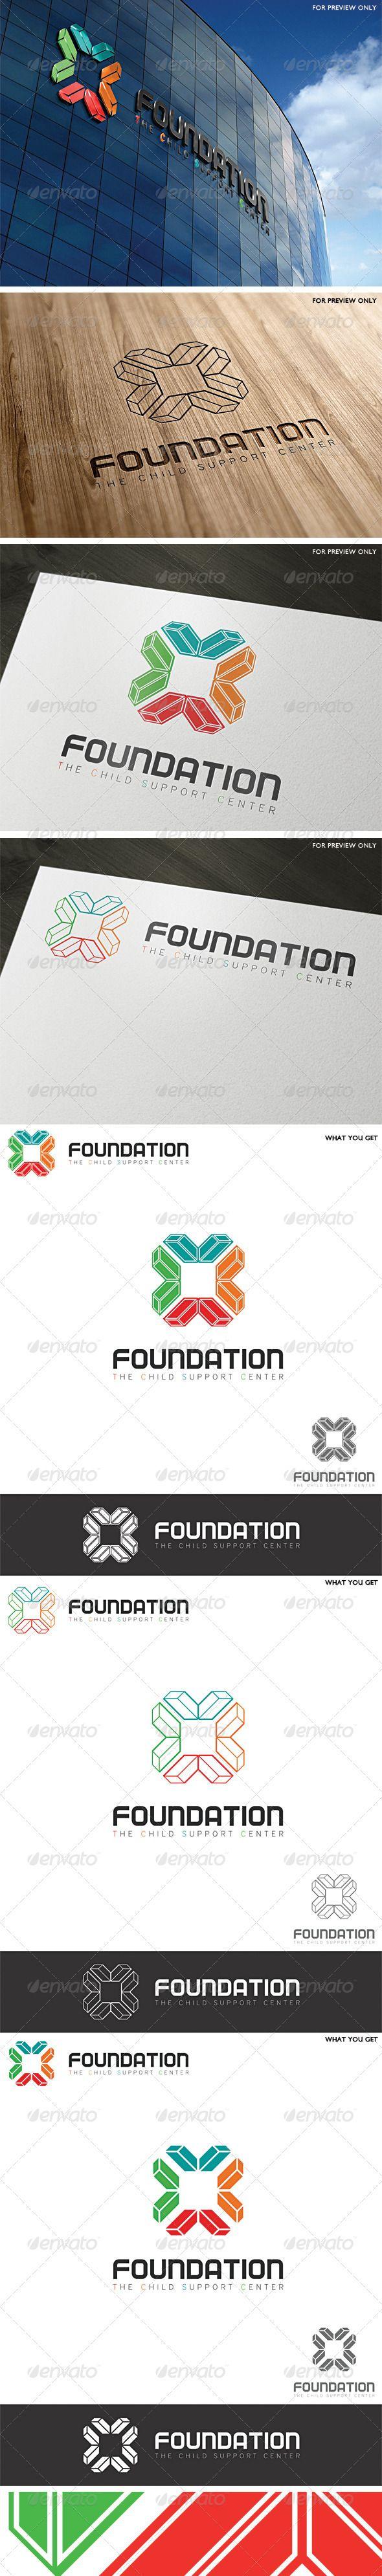 Foundation Support Center Logo T